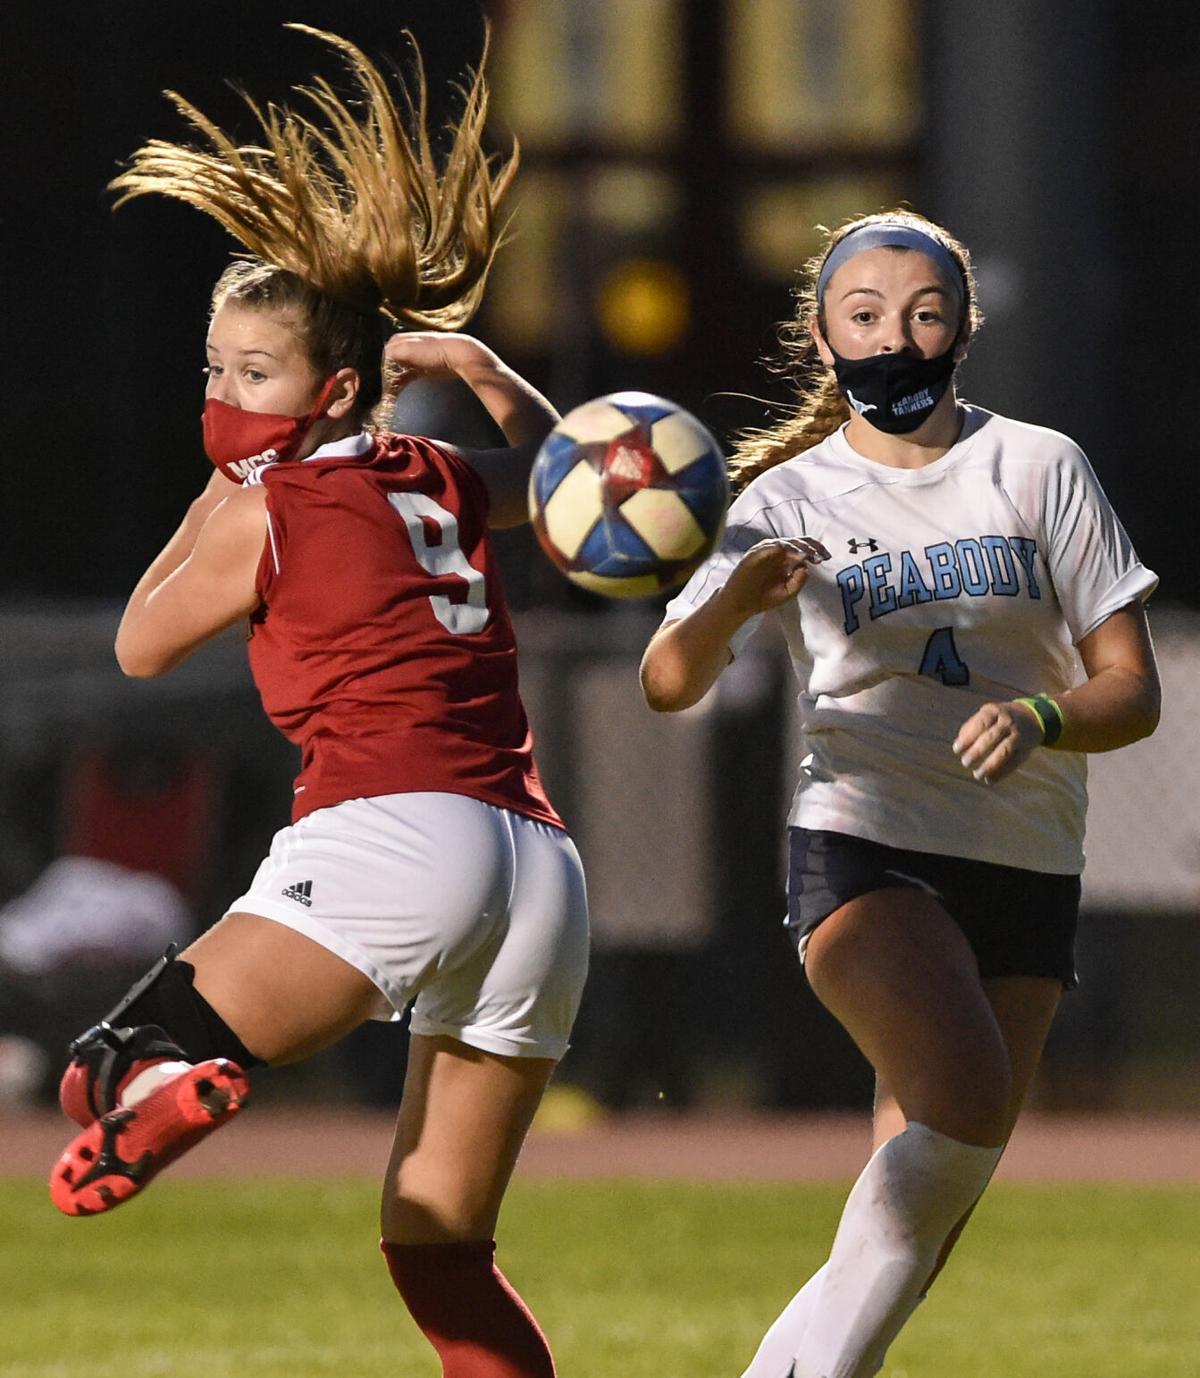 Peabody girls soccer at Masconomet varsity game